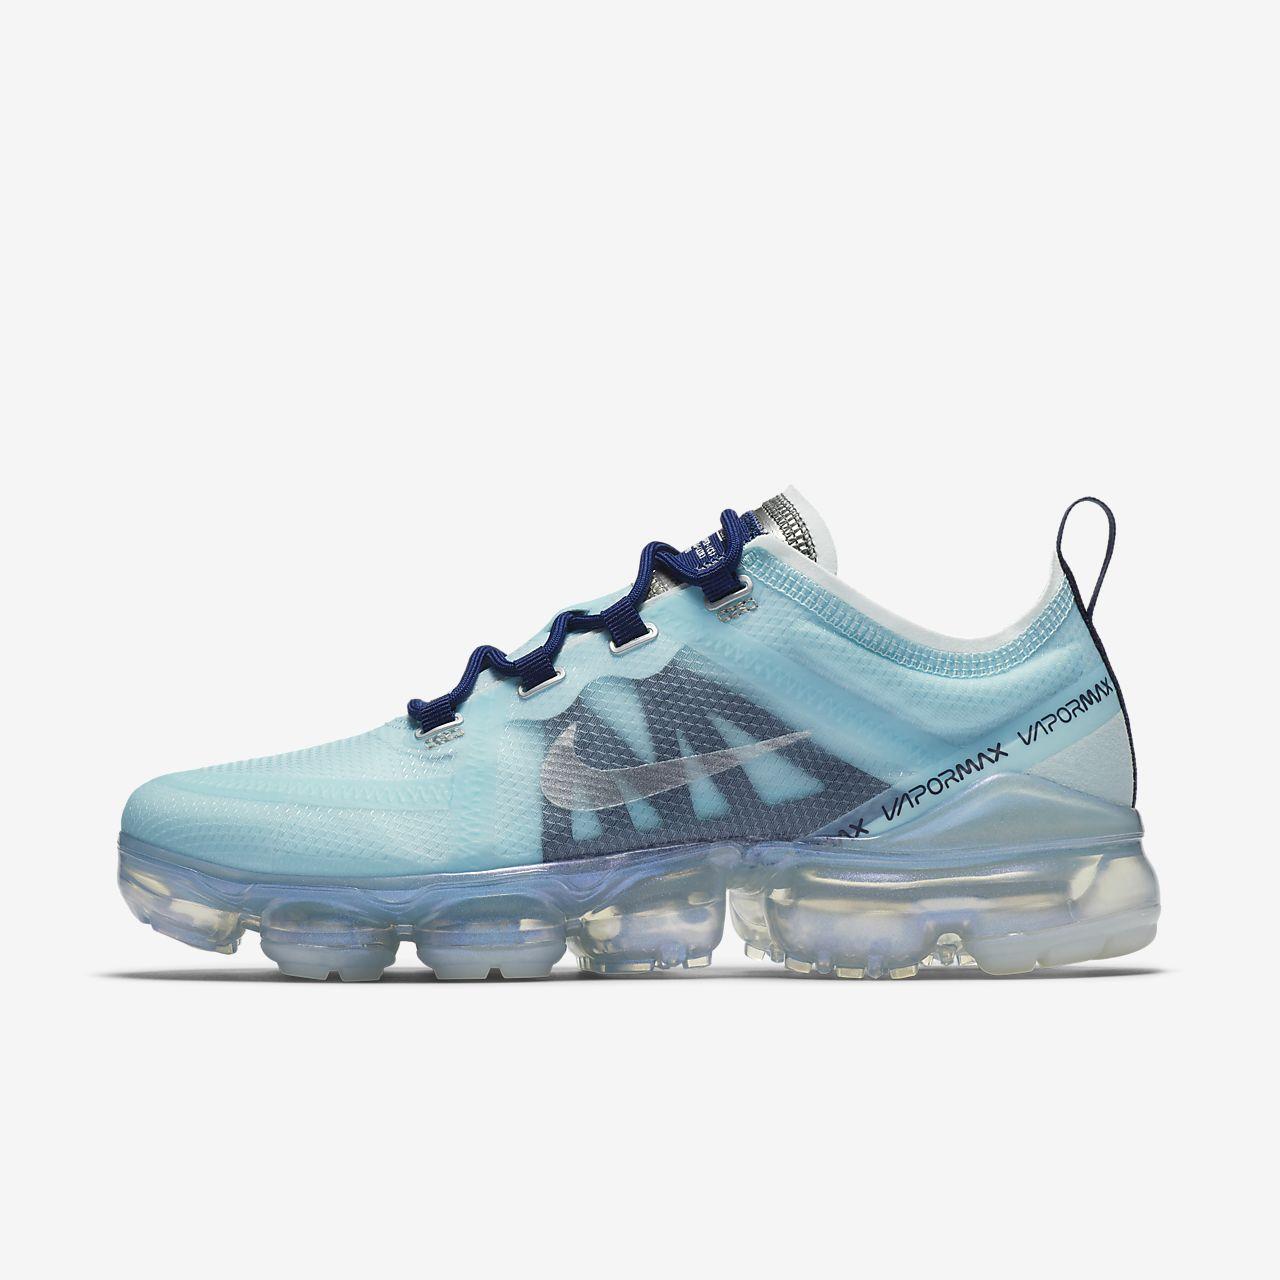 sports shoes a4d8a 35ba9 ... Nike Air VaporMax 2019 Womens Shoe